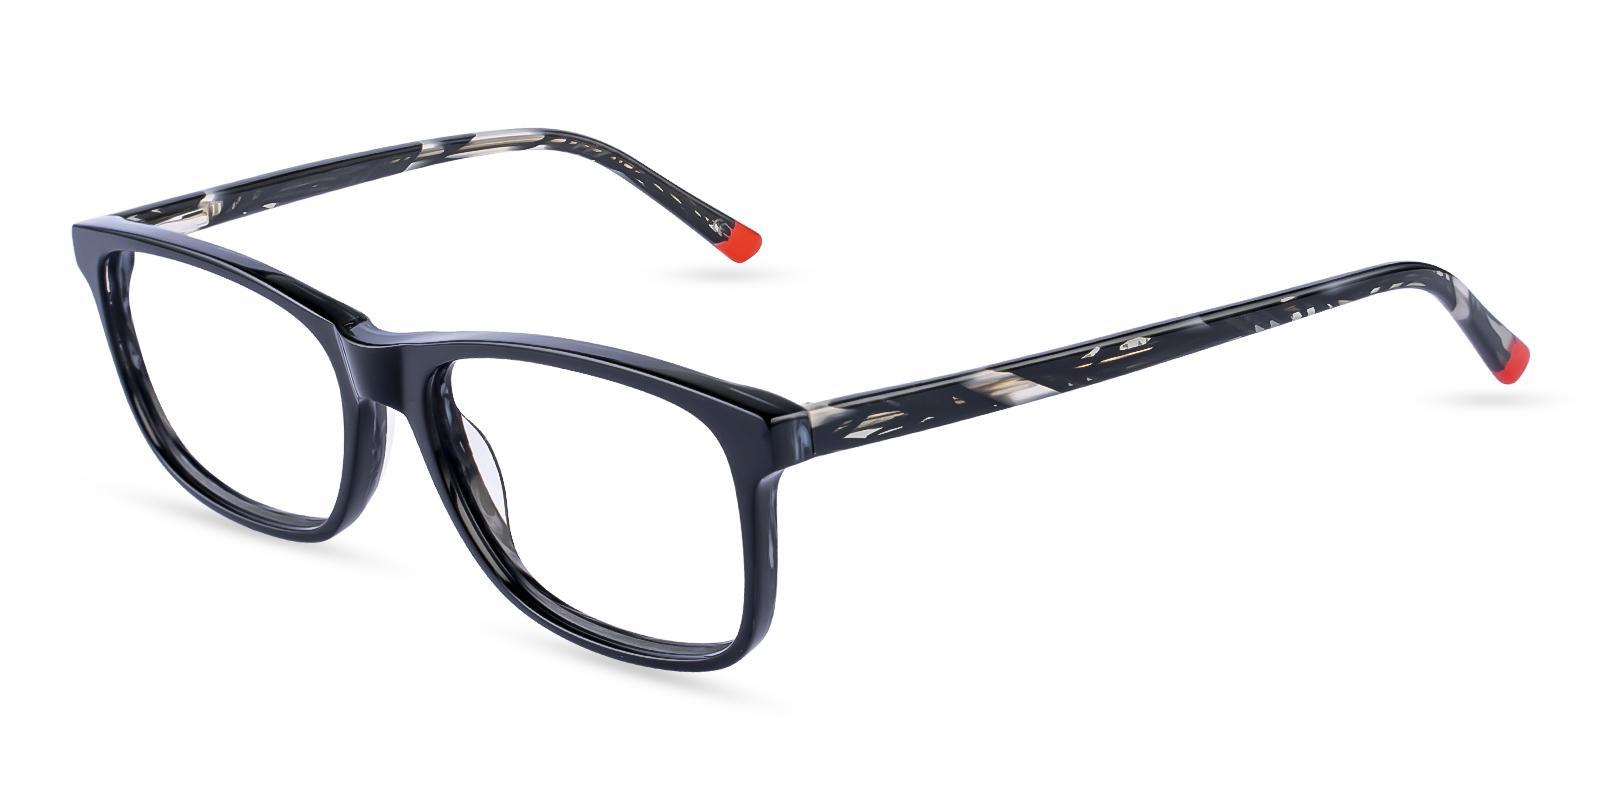 Gilcres Pattern Acetate Eyeglasses , SpringHinges , UniversalBridgeFit Frames from ABBE Glasses